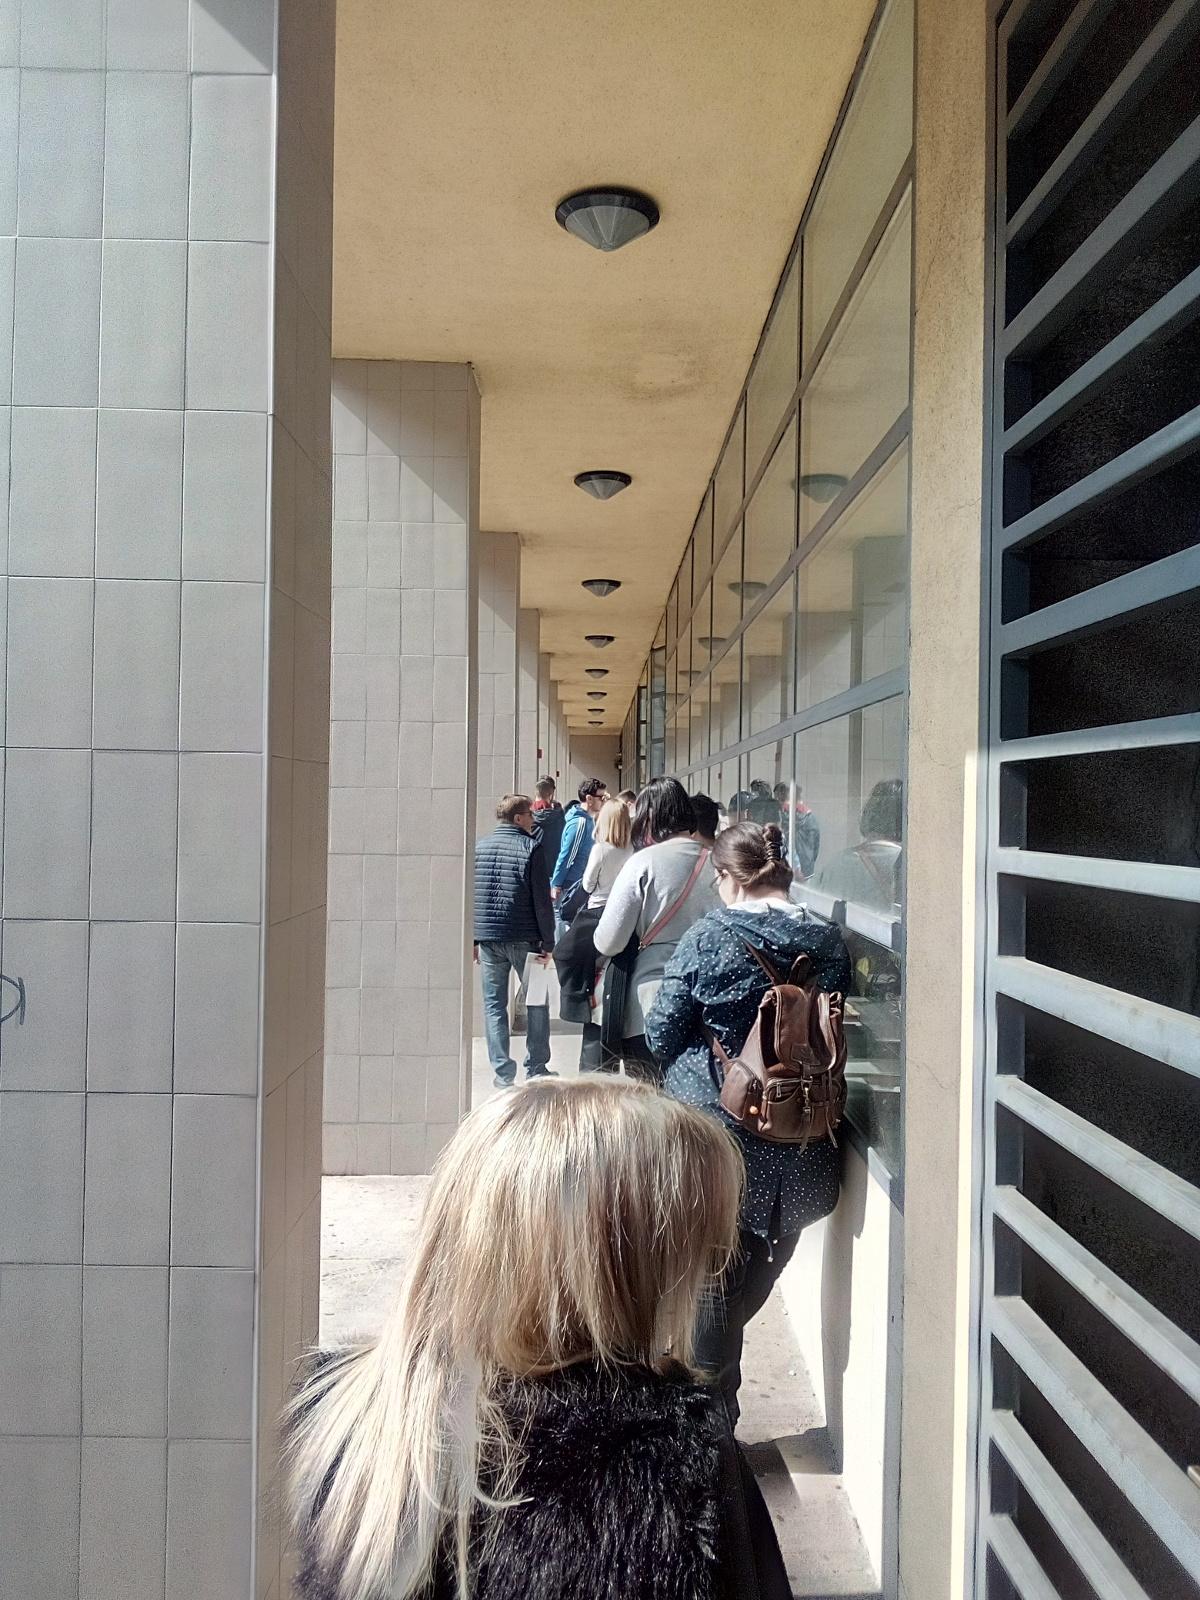 Otpušteni konobari čekaju u redu ispred HZZ-a